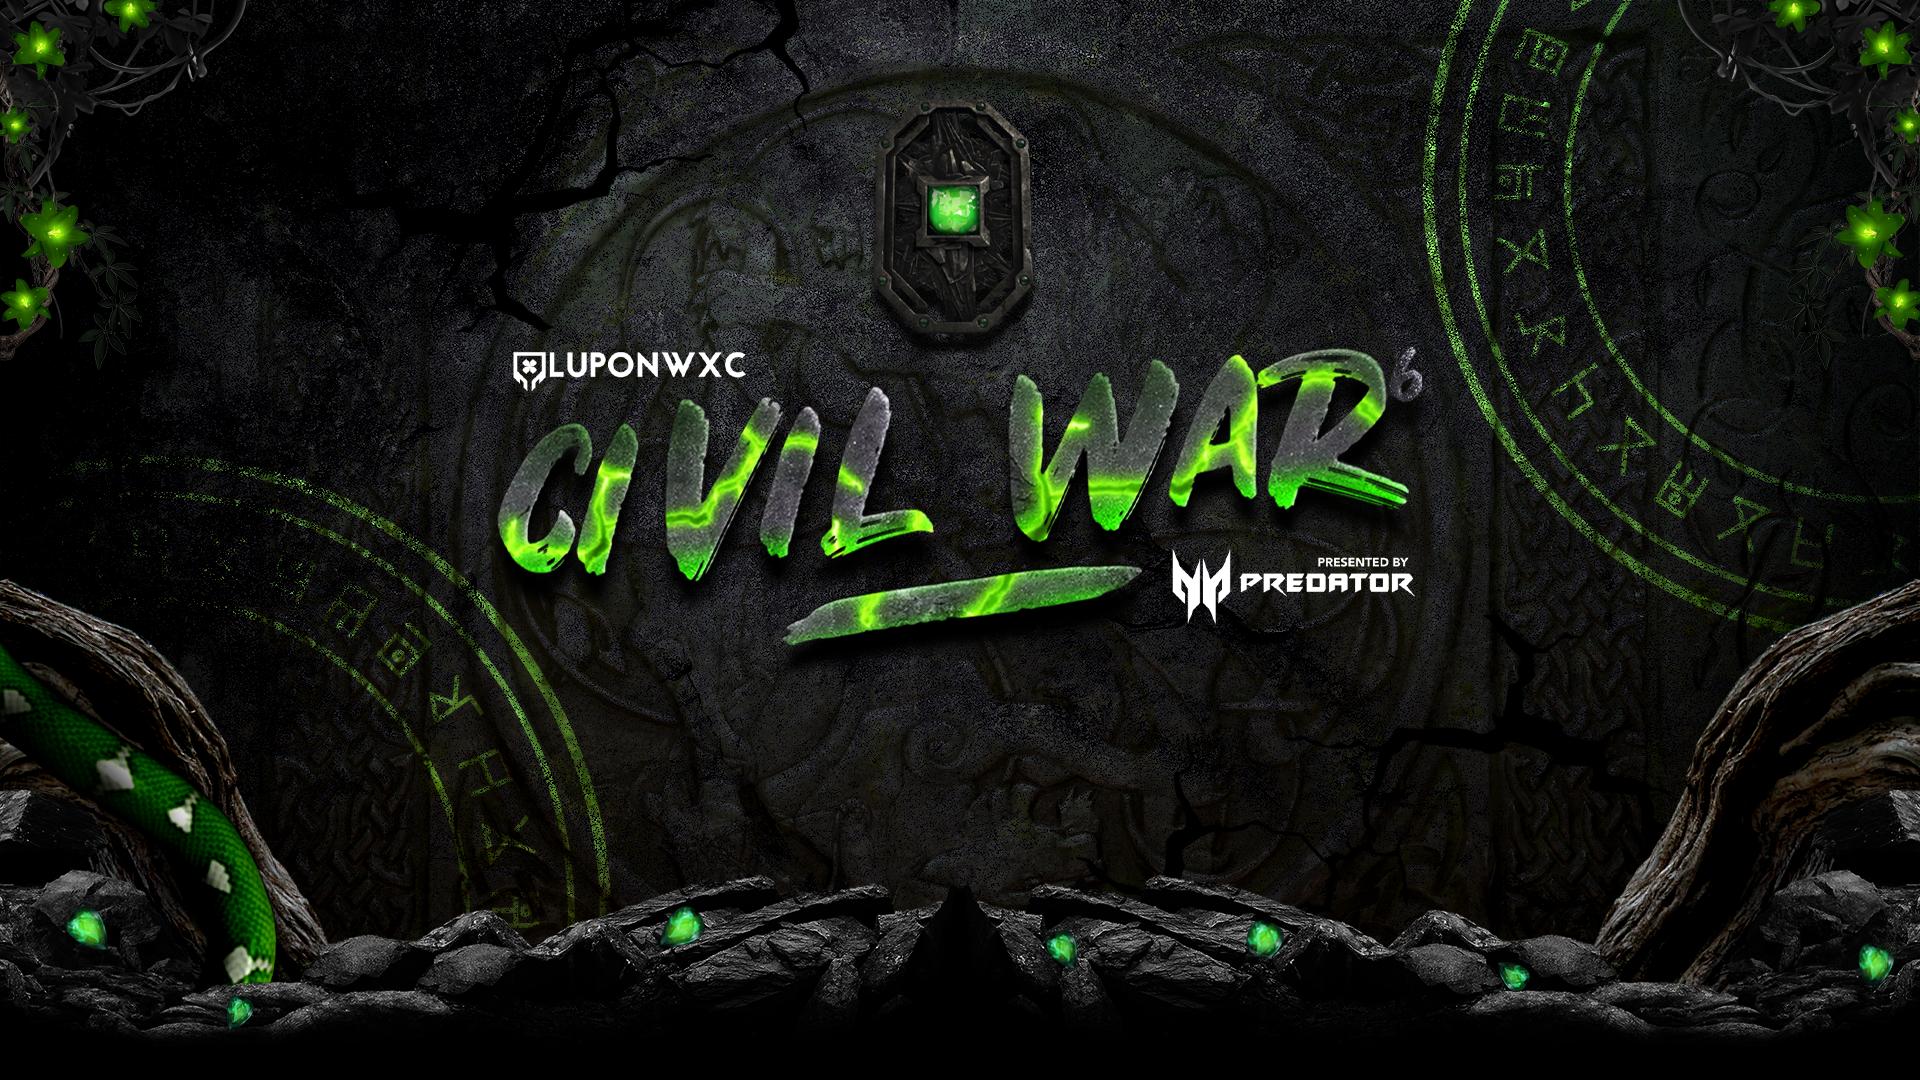 Civil War Season 6 begins now